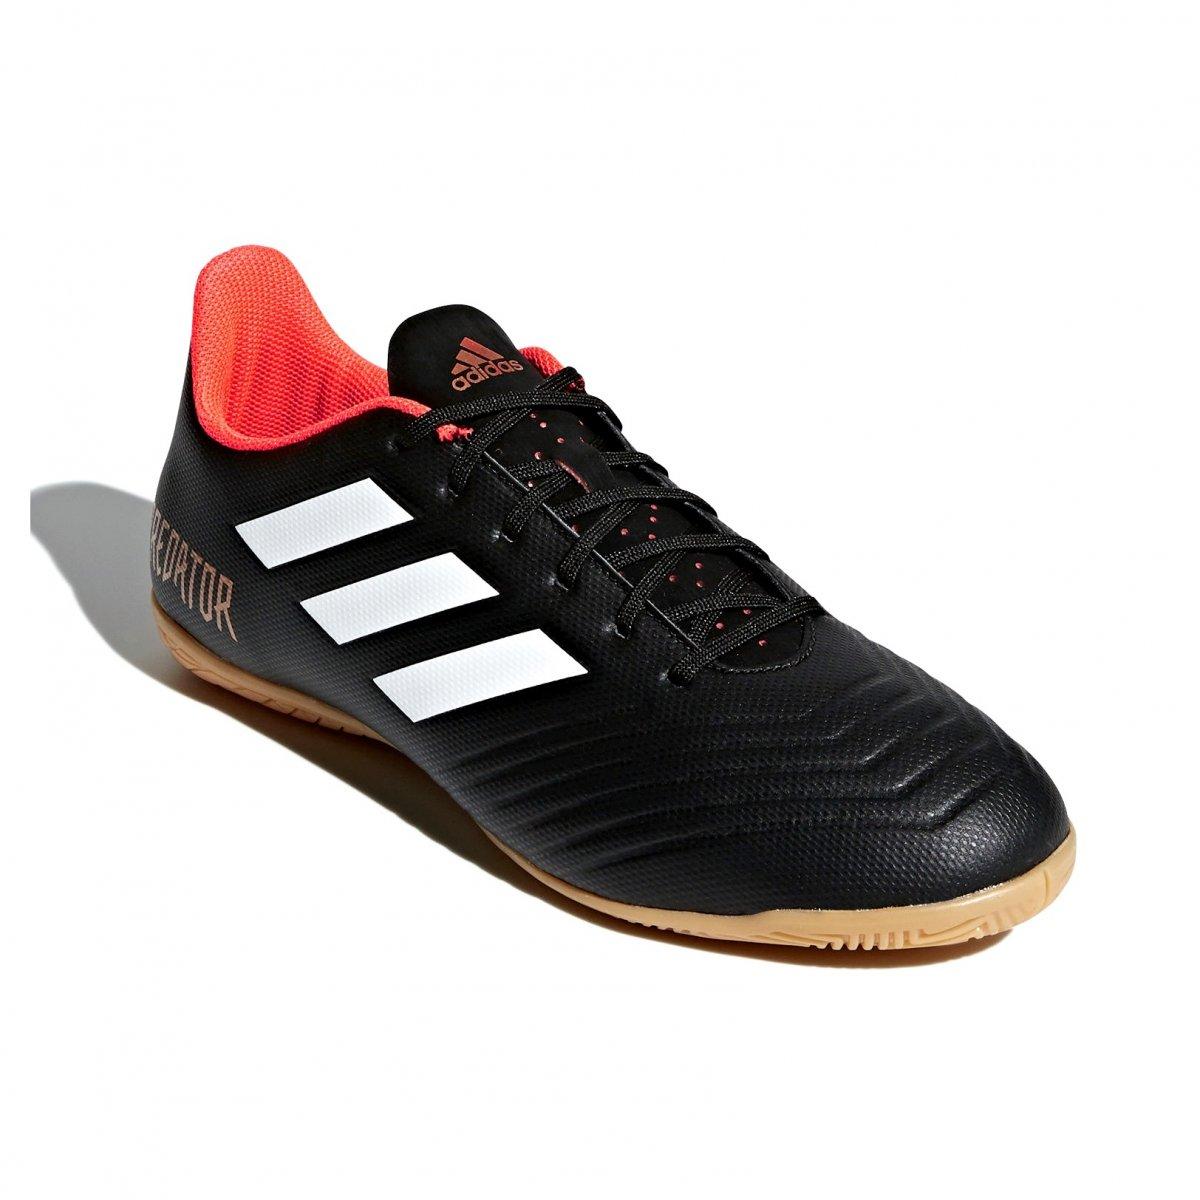 e6856a1535414 Indoor Futsal Adidas Predator Tango 18.4 IN CP9275 - Preto Laranja ...